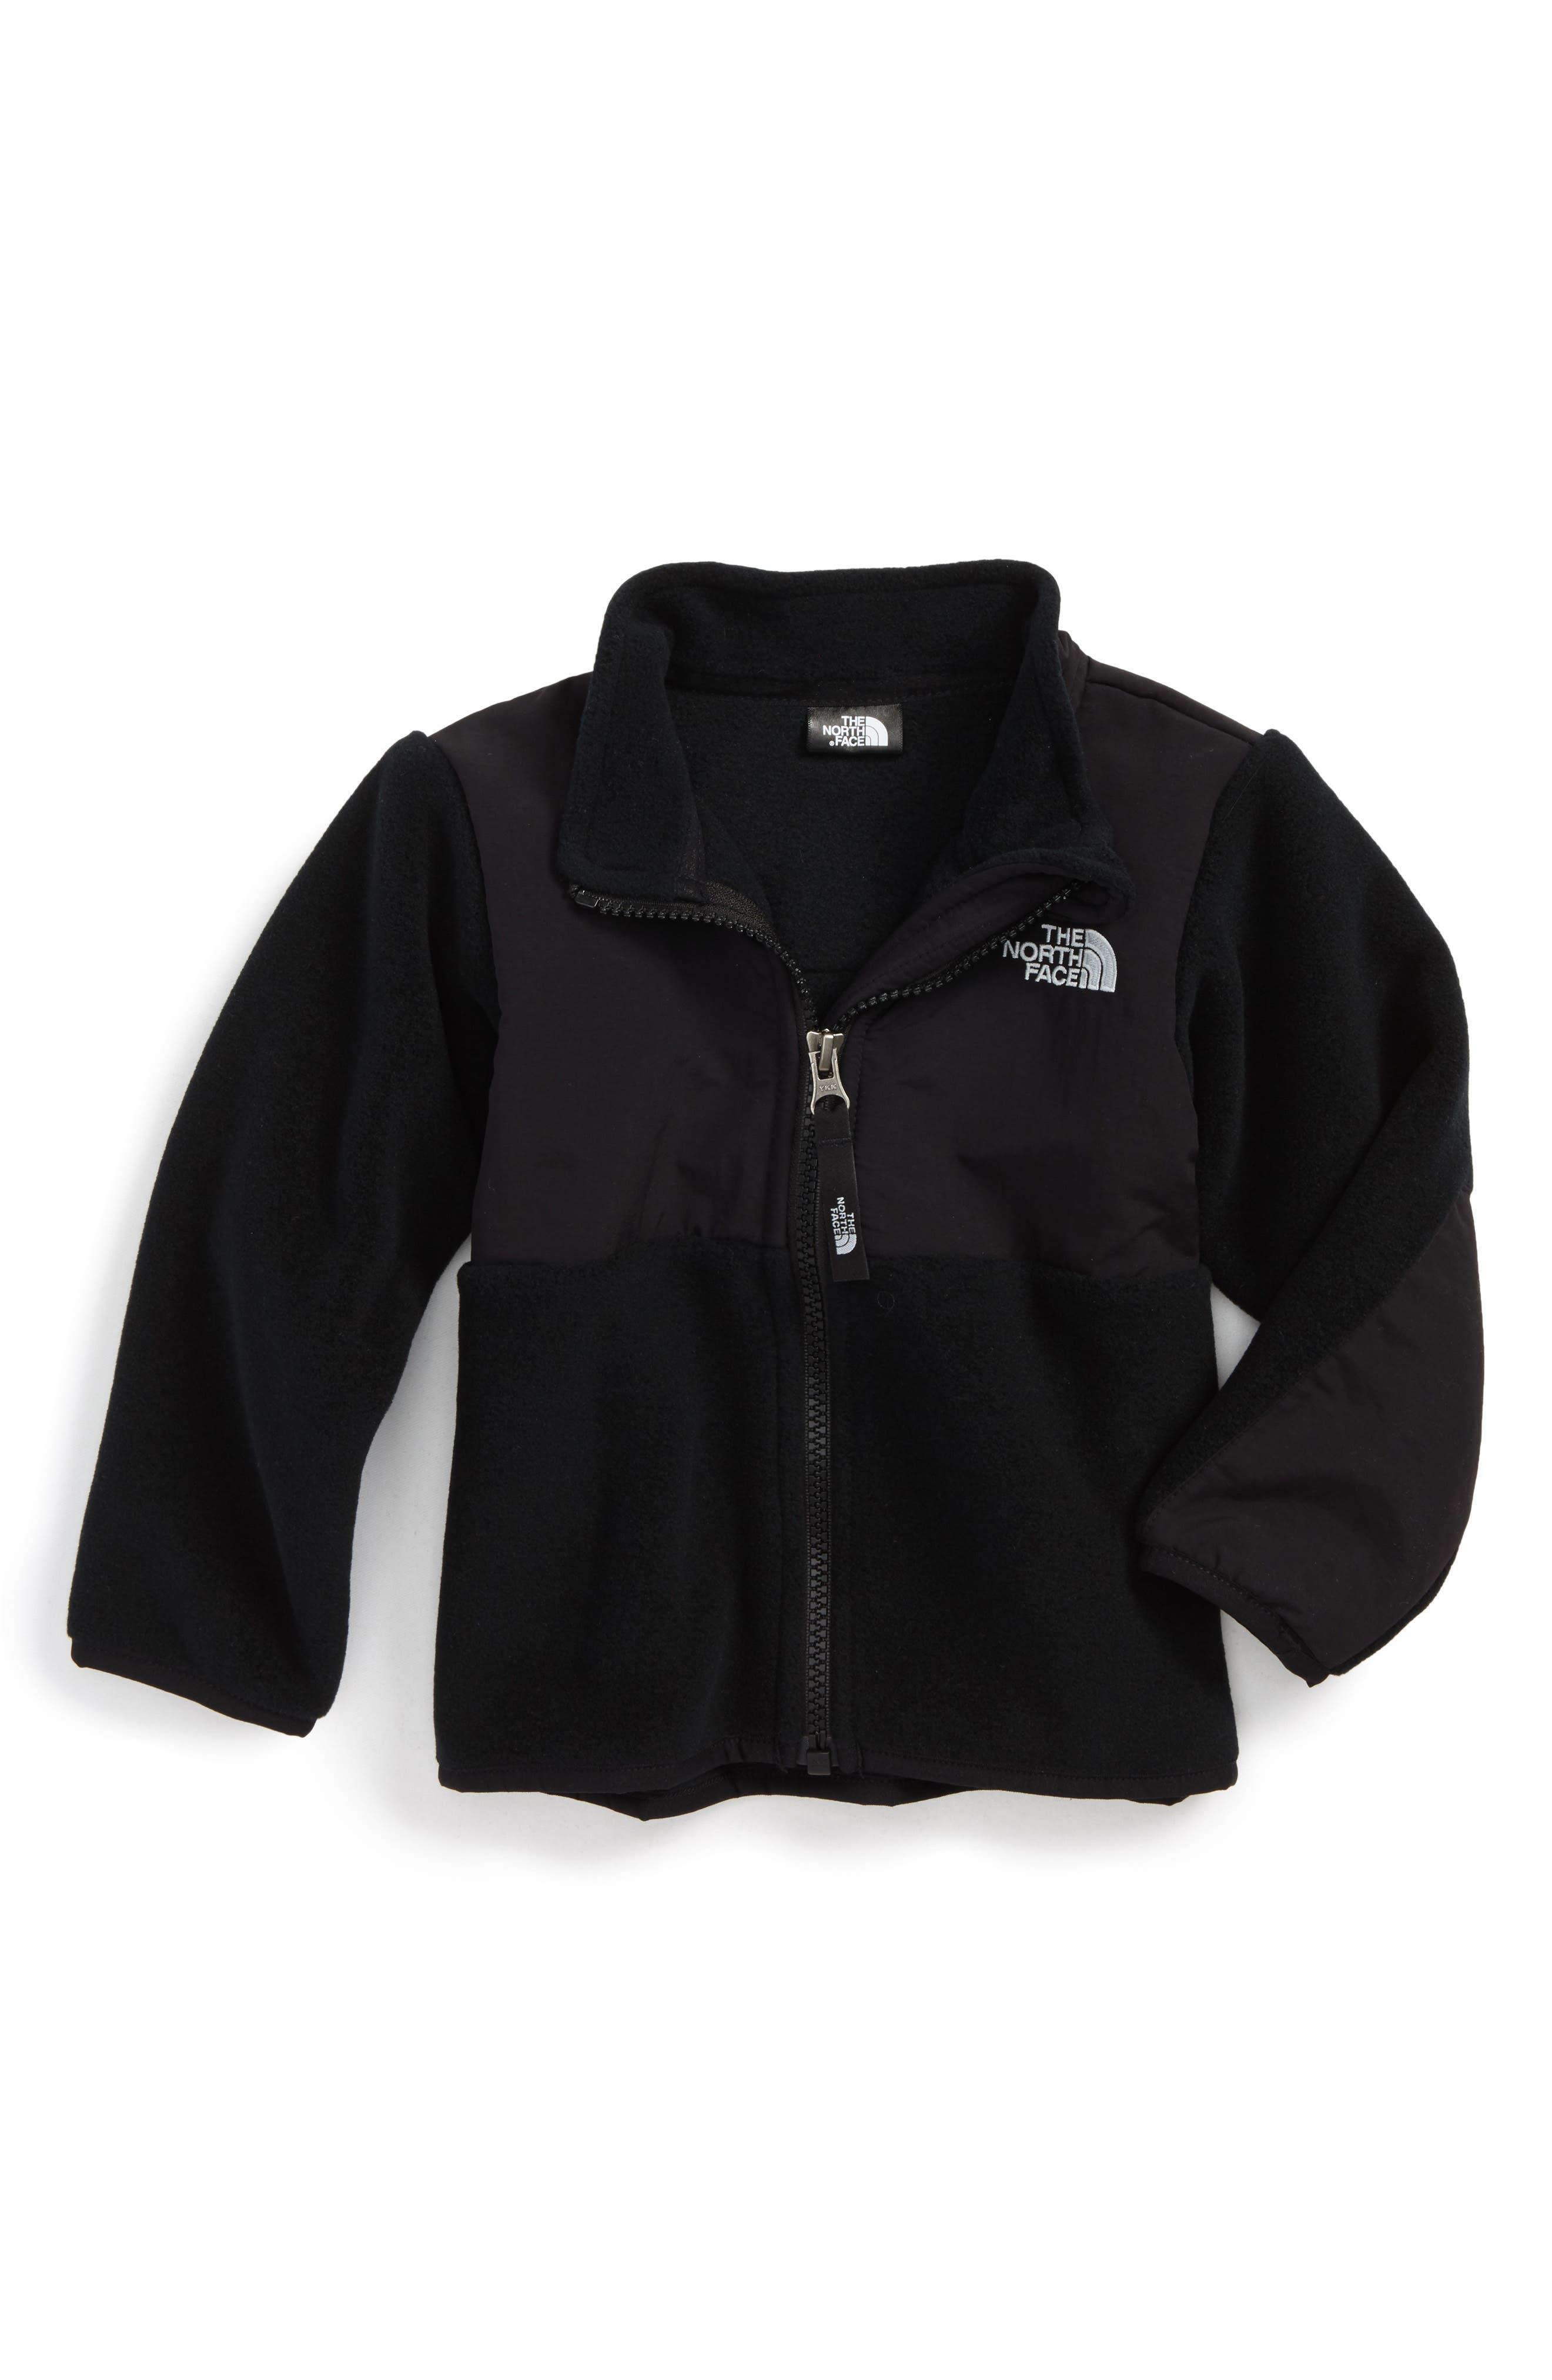 Denali Recycled Fleece Jacket,                         Main,                         color, Tnf Black